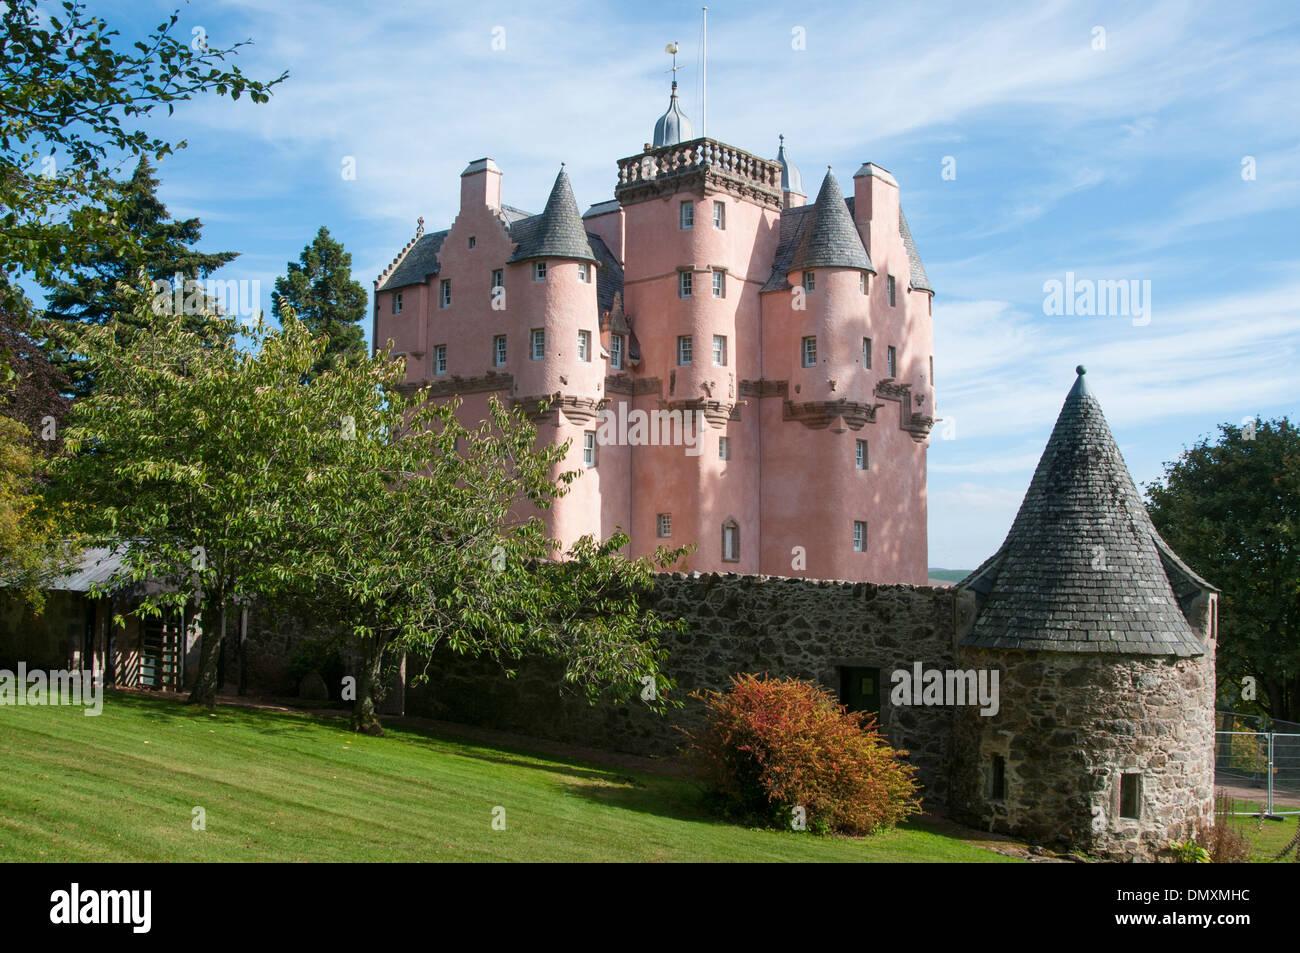 craigievar castle royal deeside scottish castle - Stock Image